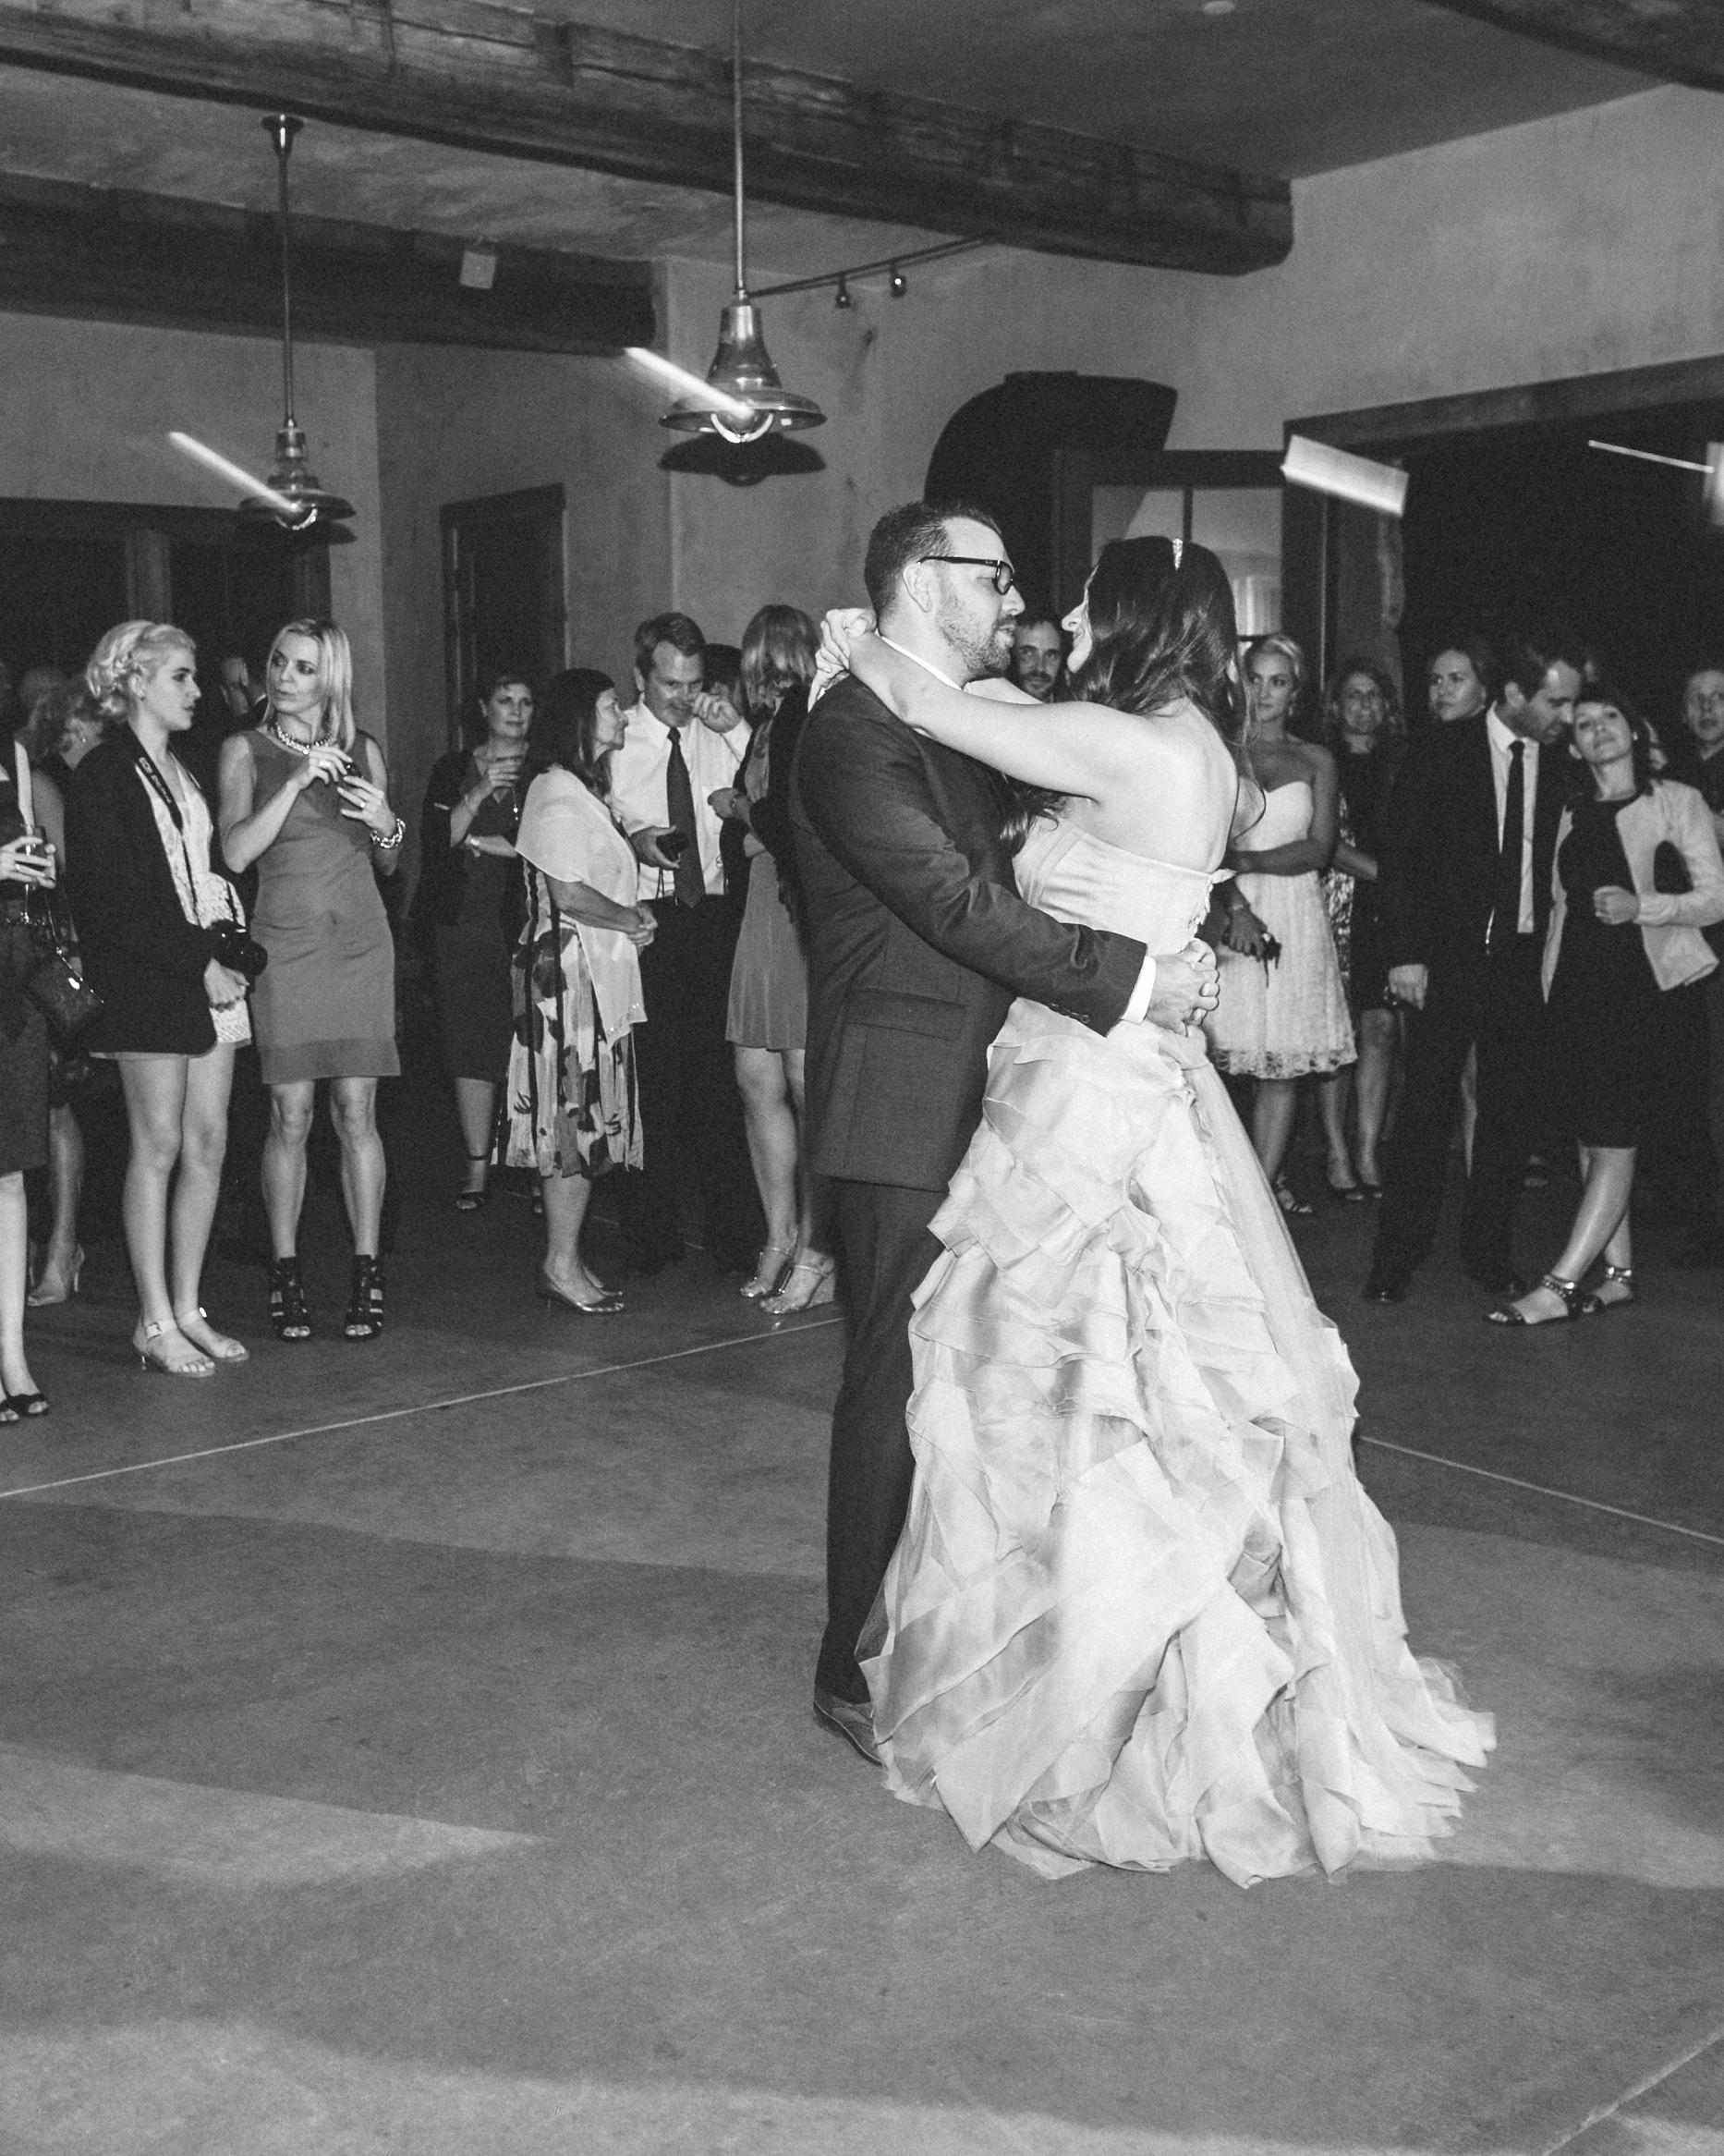 briana-adam-wedding-firstdance-1522-s112471-1215.jpg